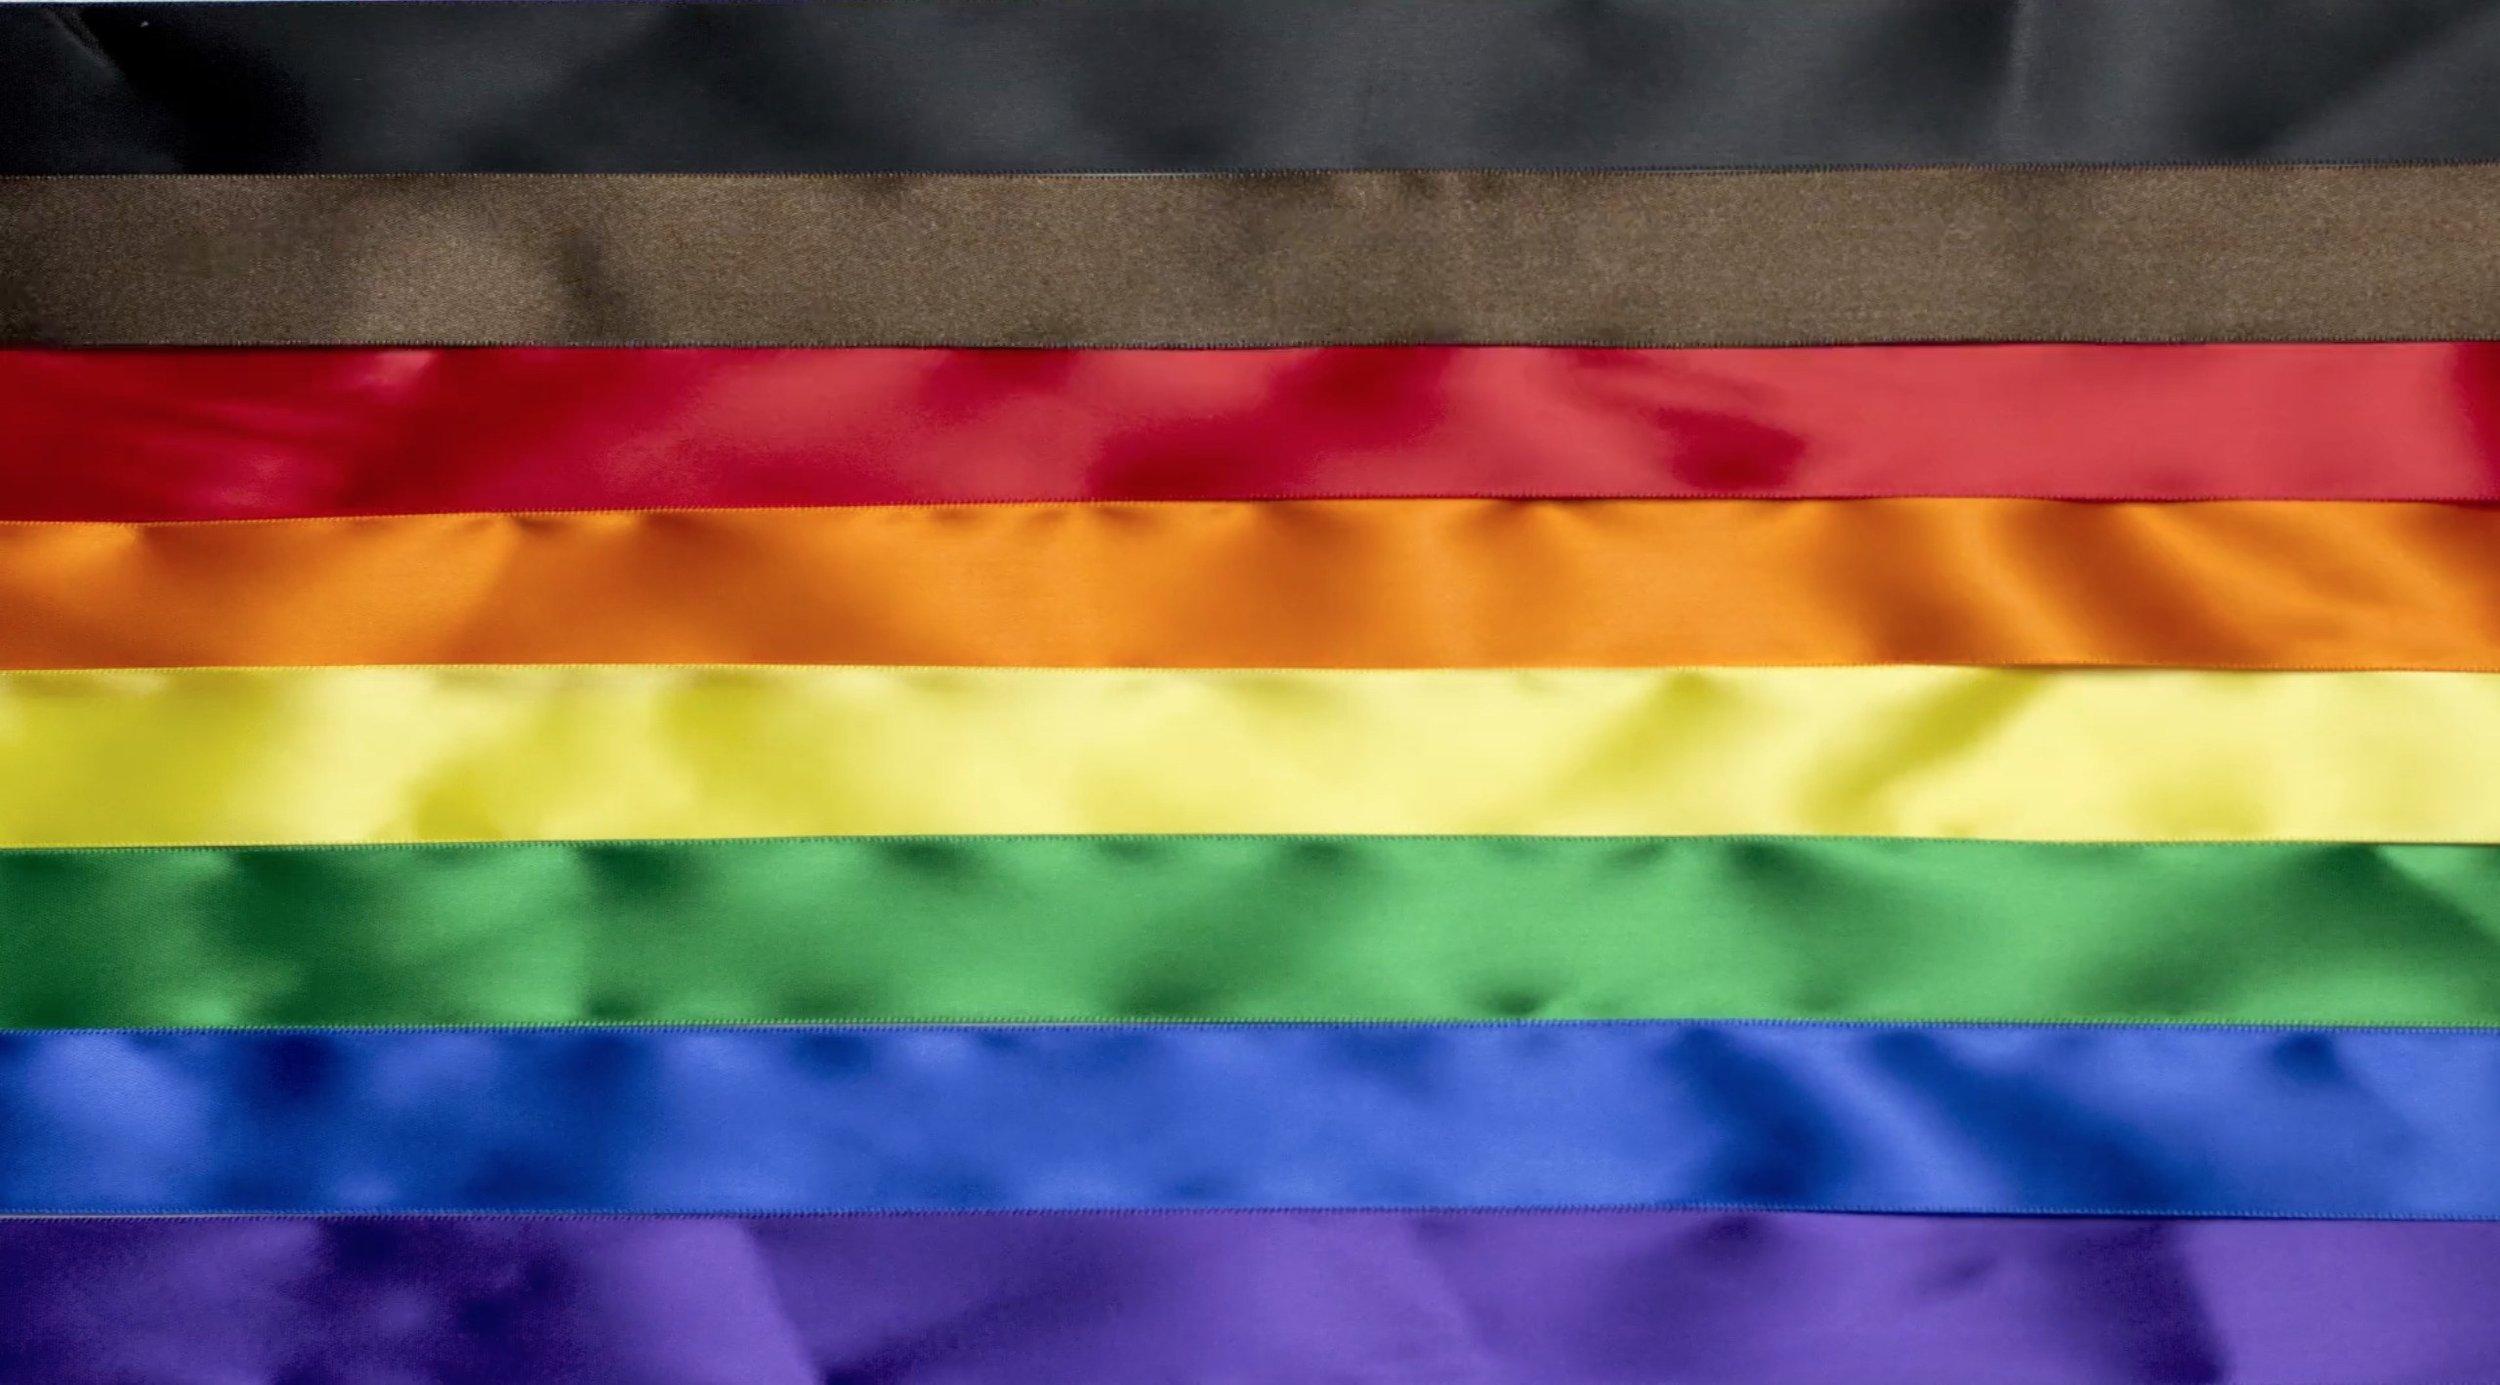 gayflag5.jpg